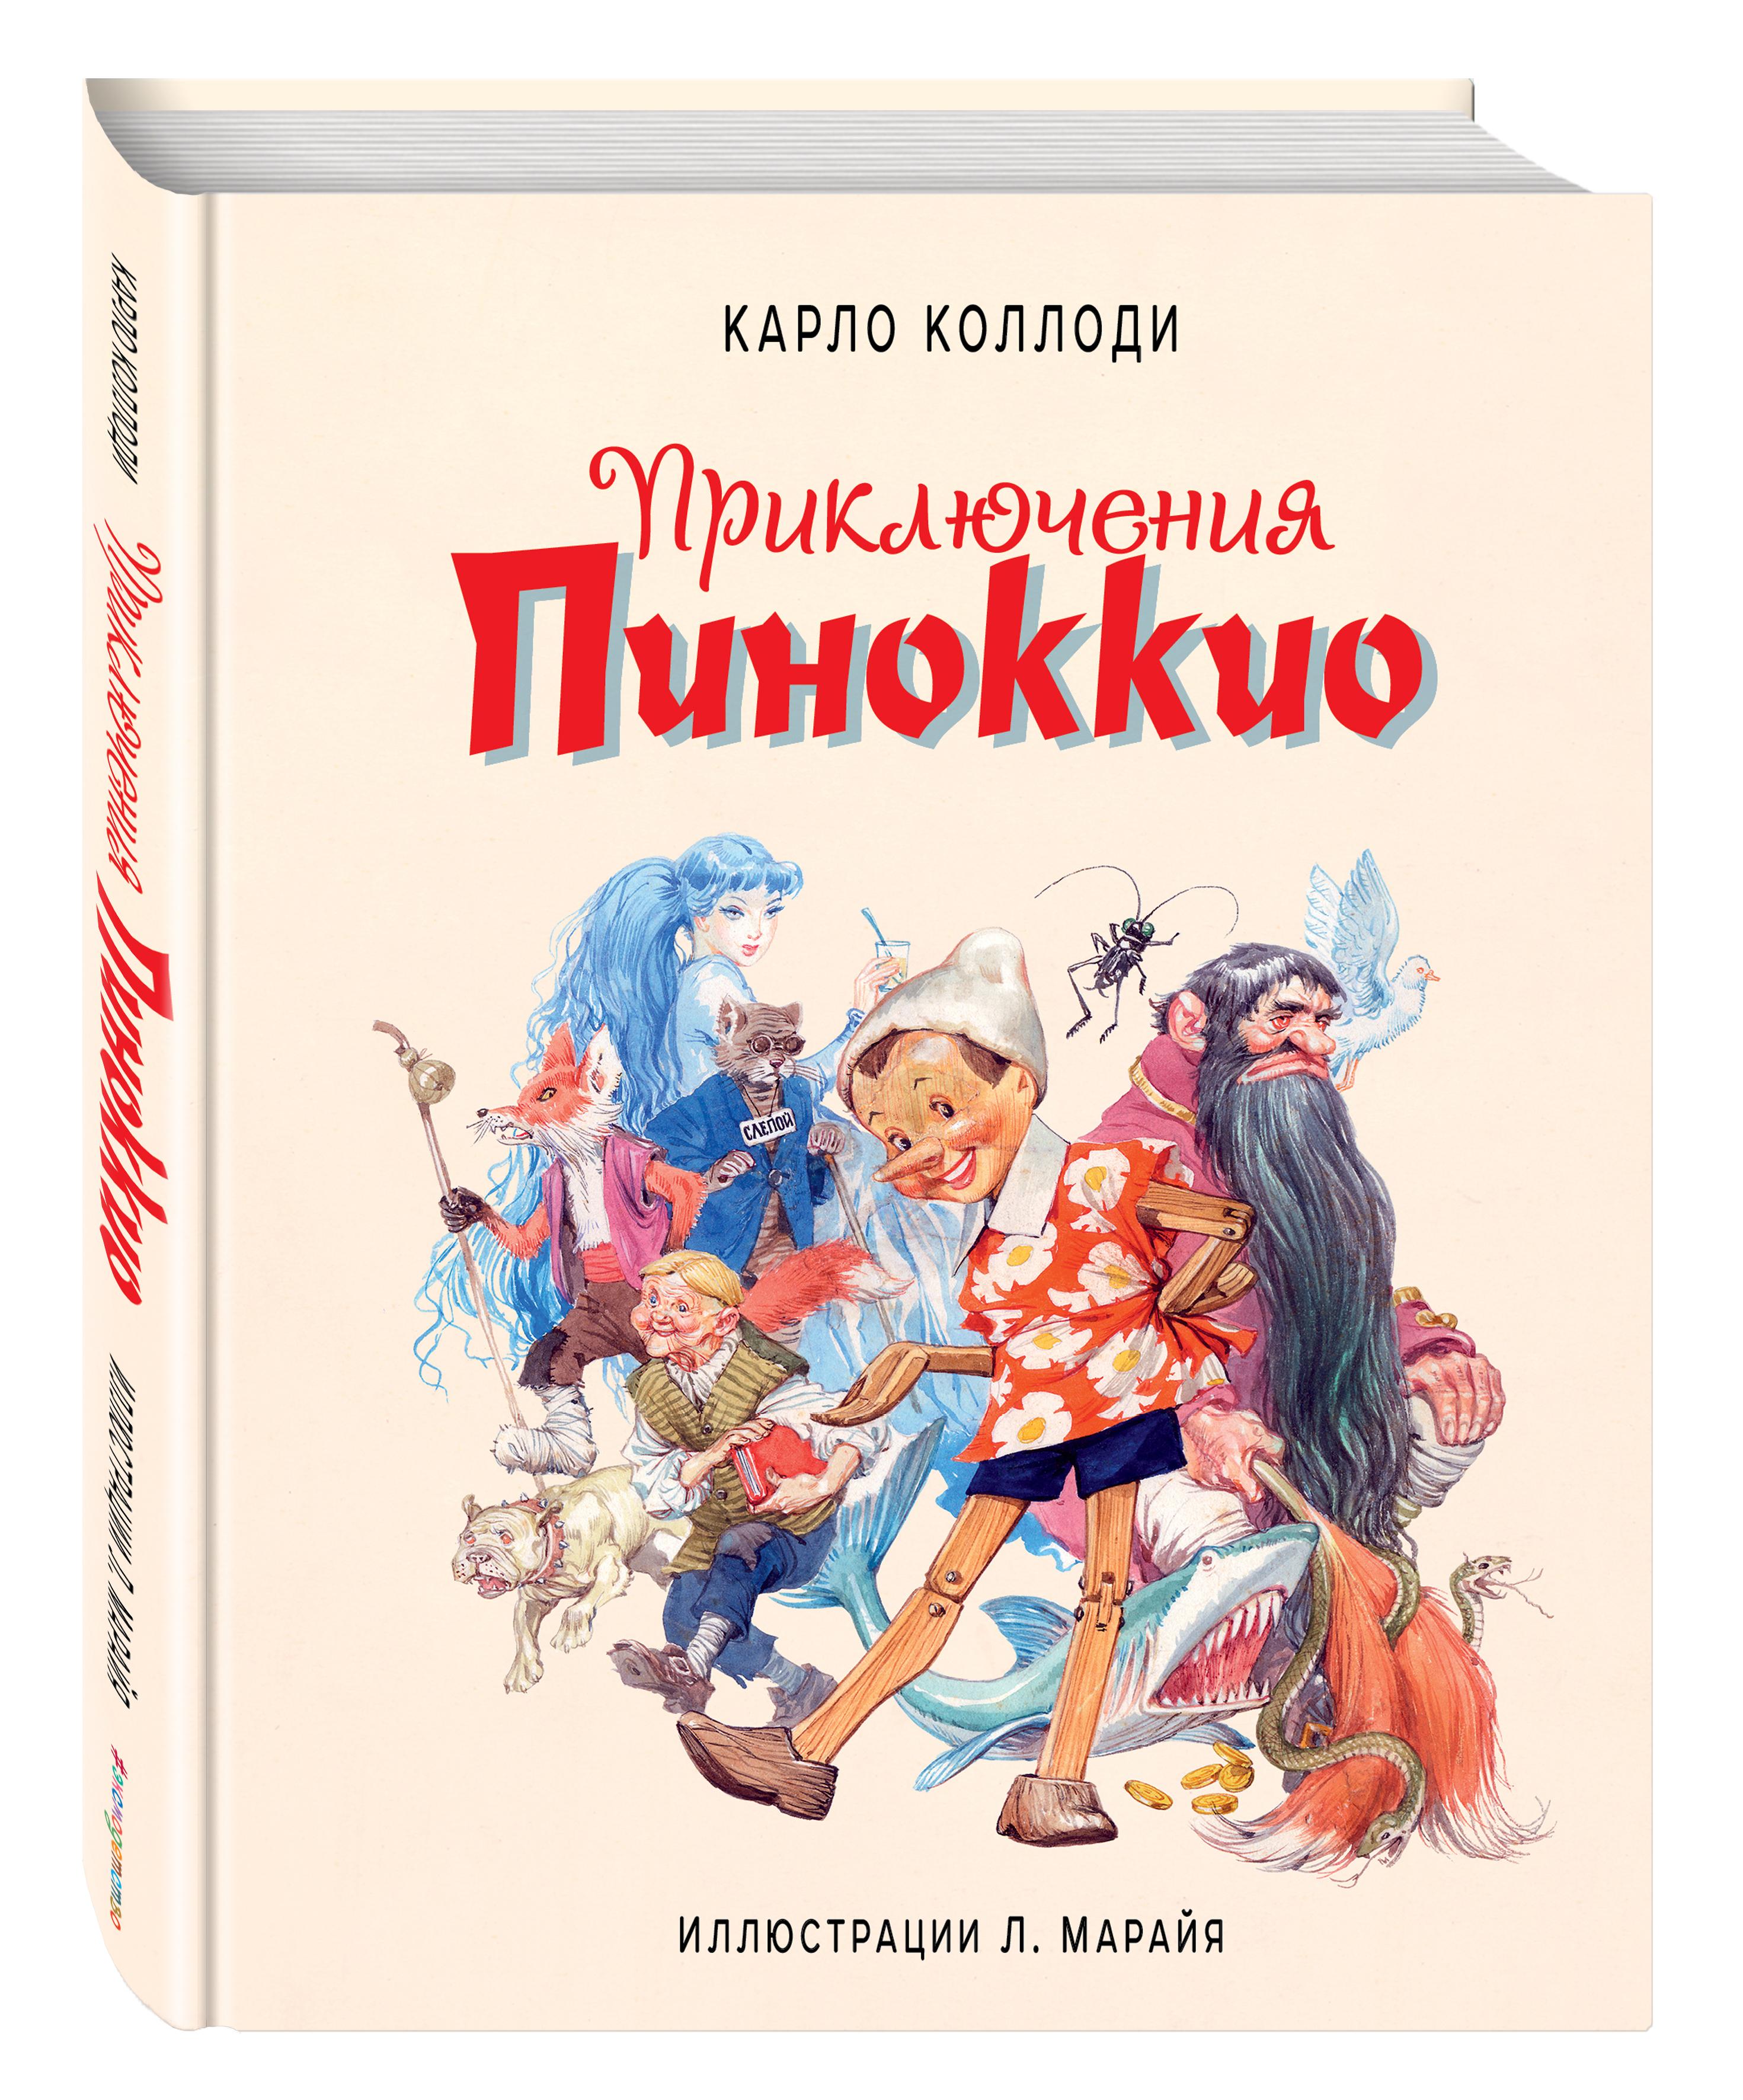 Карло Коллоди Приключения Пиноккио коллоди к приключения пиноккио the adventures of pinocchio домашнее чтение mp3